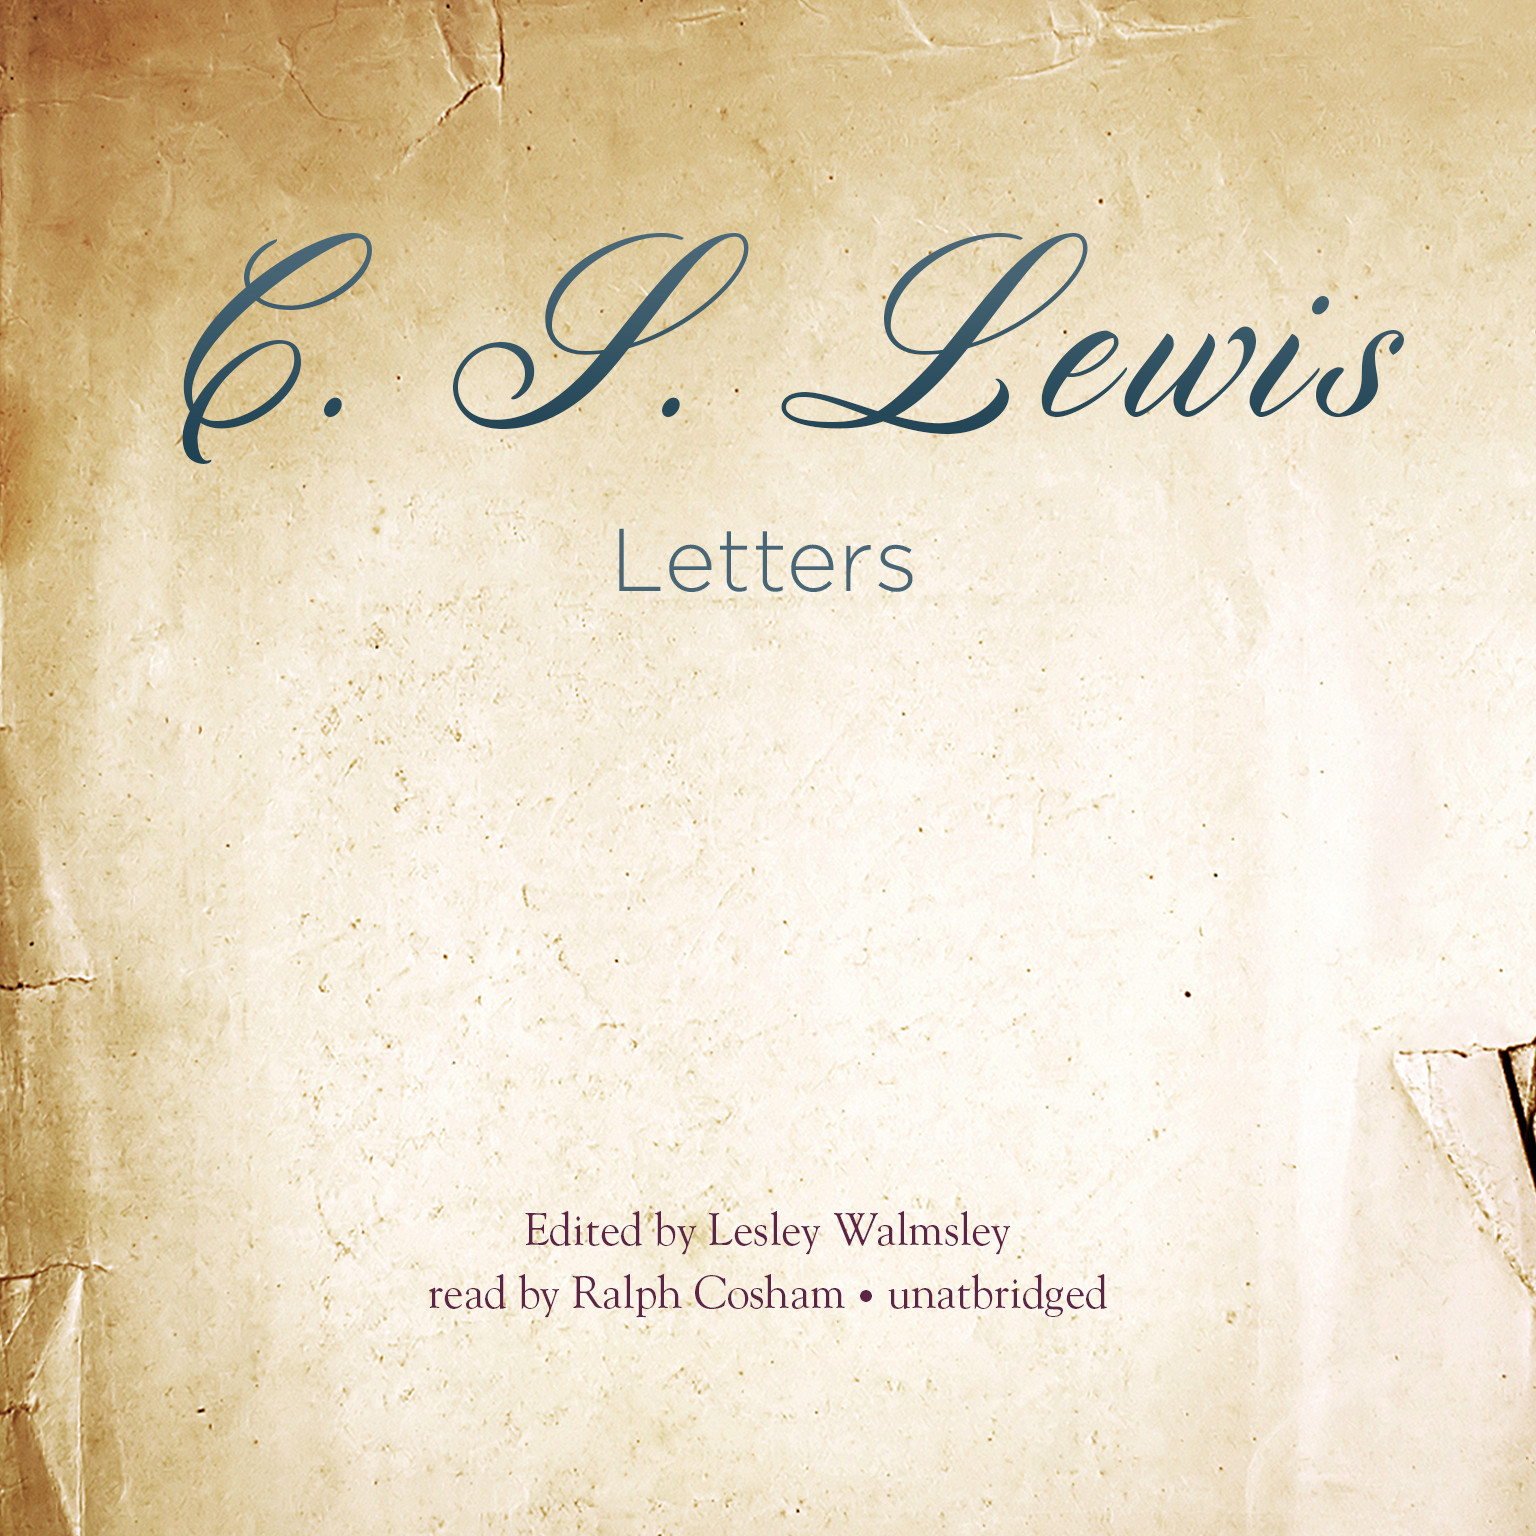 c s lewis essay collection